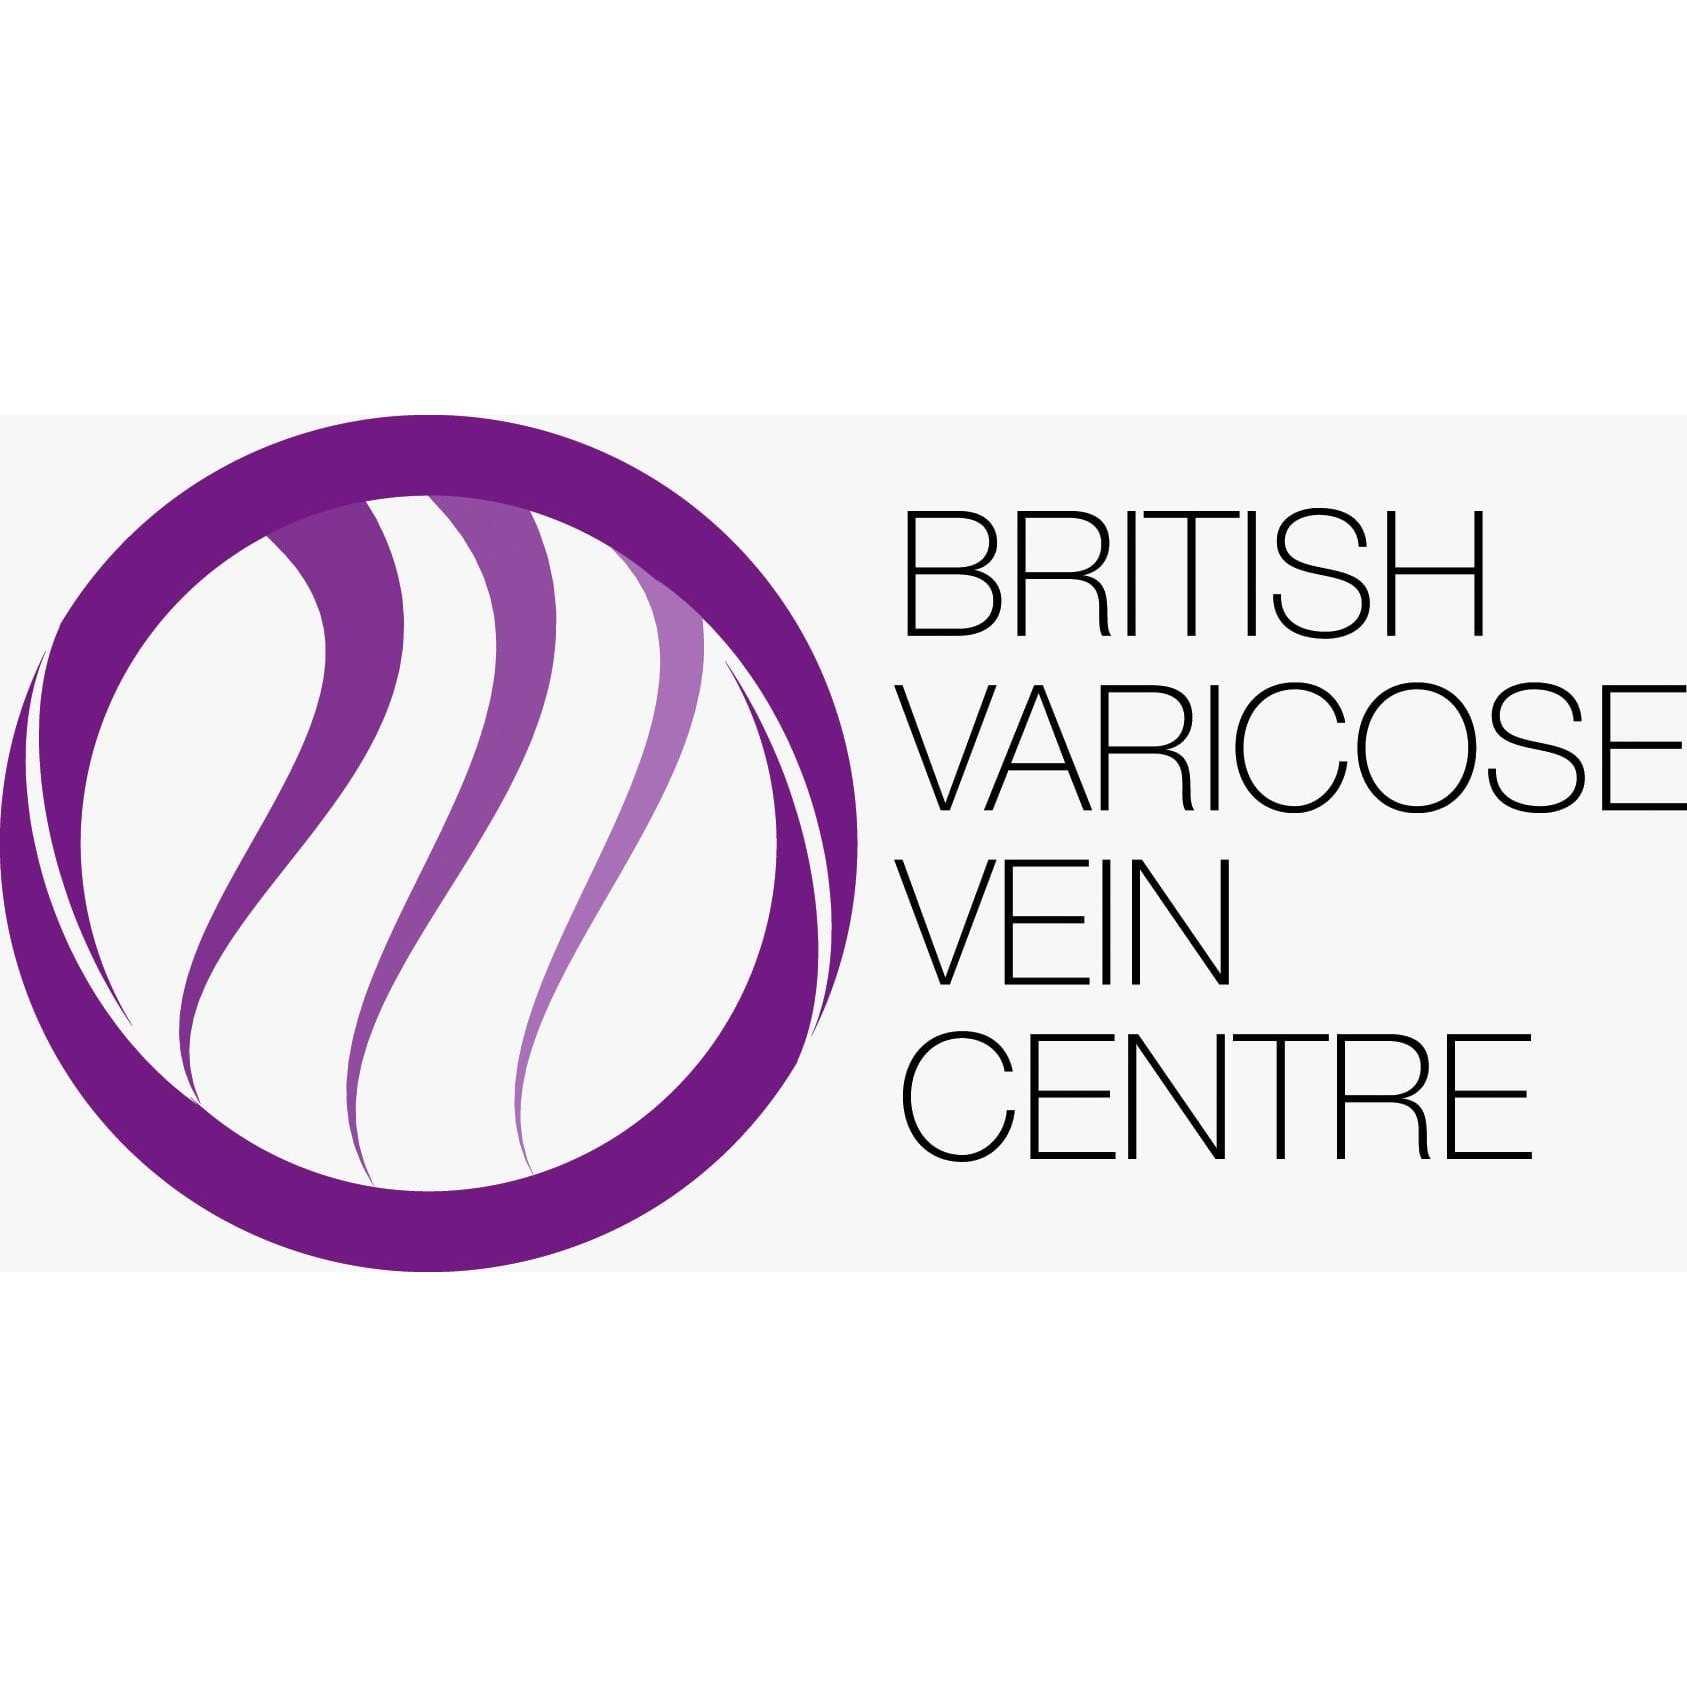 British Varicose Vein Centre - London, London NW8 9NH - 020 7286 7274 | ShowMeLocal.com